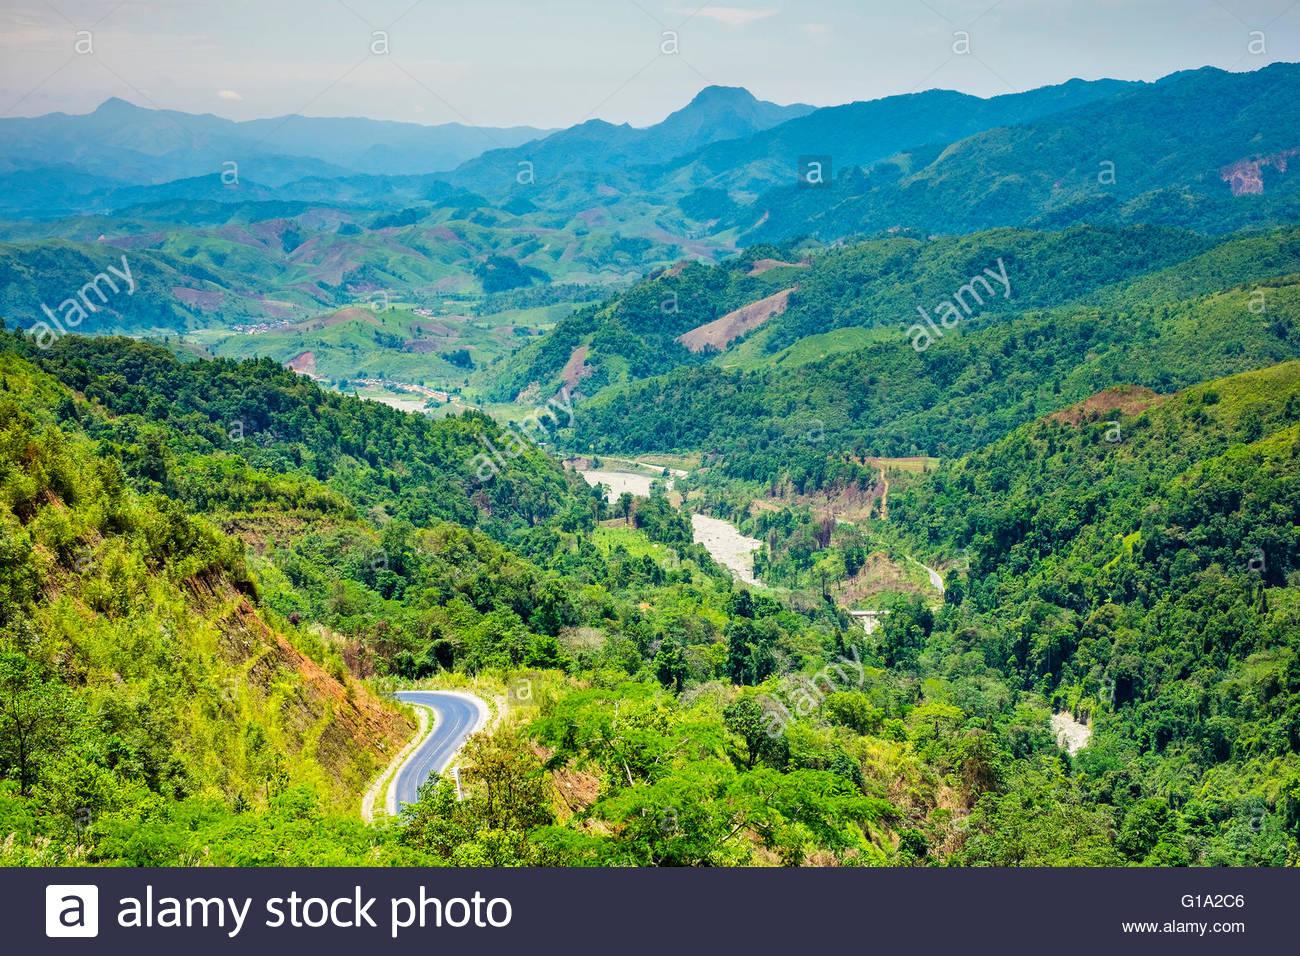 Sanfte Hügel und Berge, üppige Landschaft, Louangphabang Provinz, Laos Stockbild